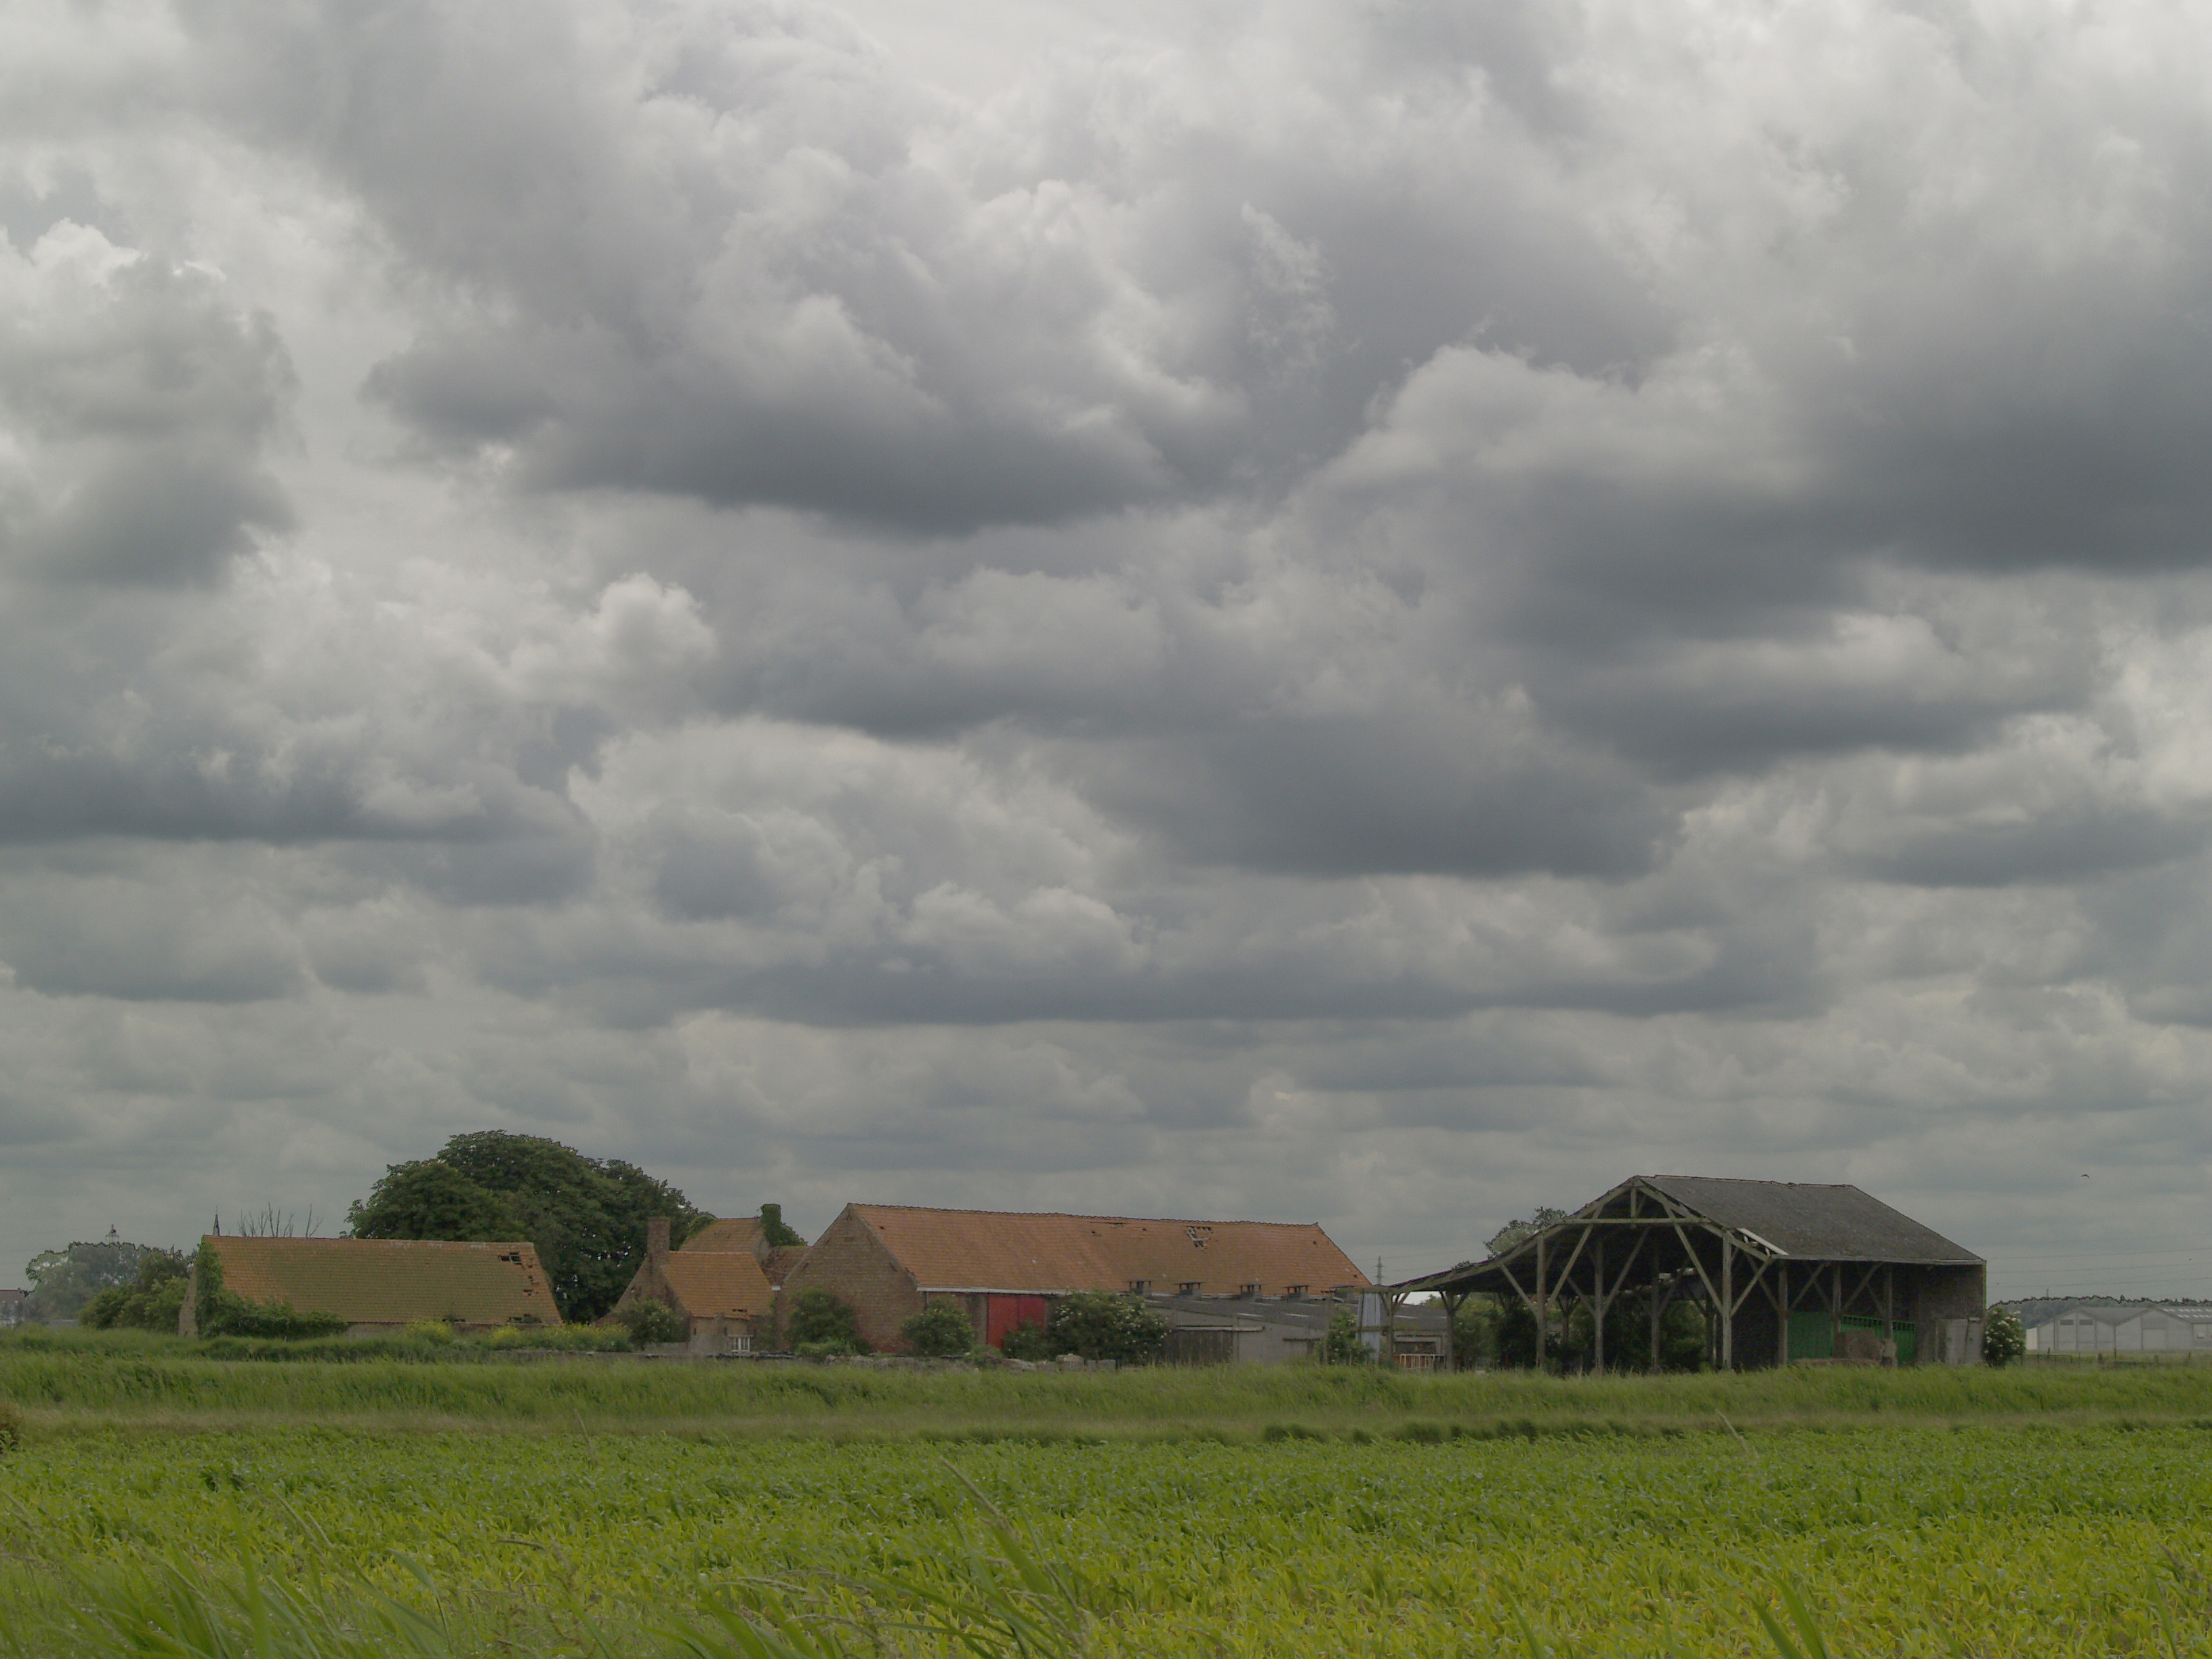 Flemish farm photo